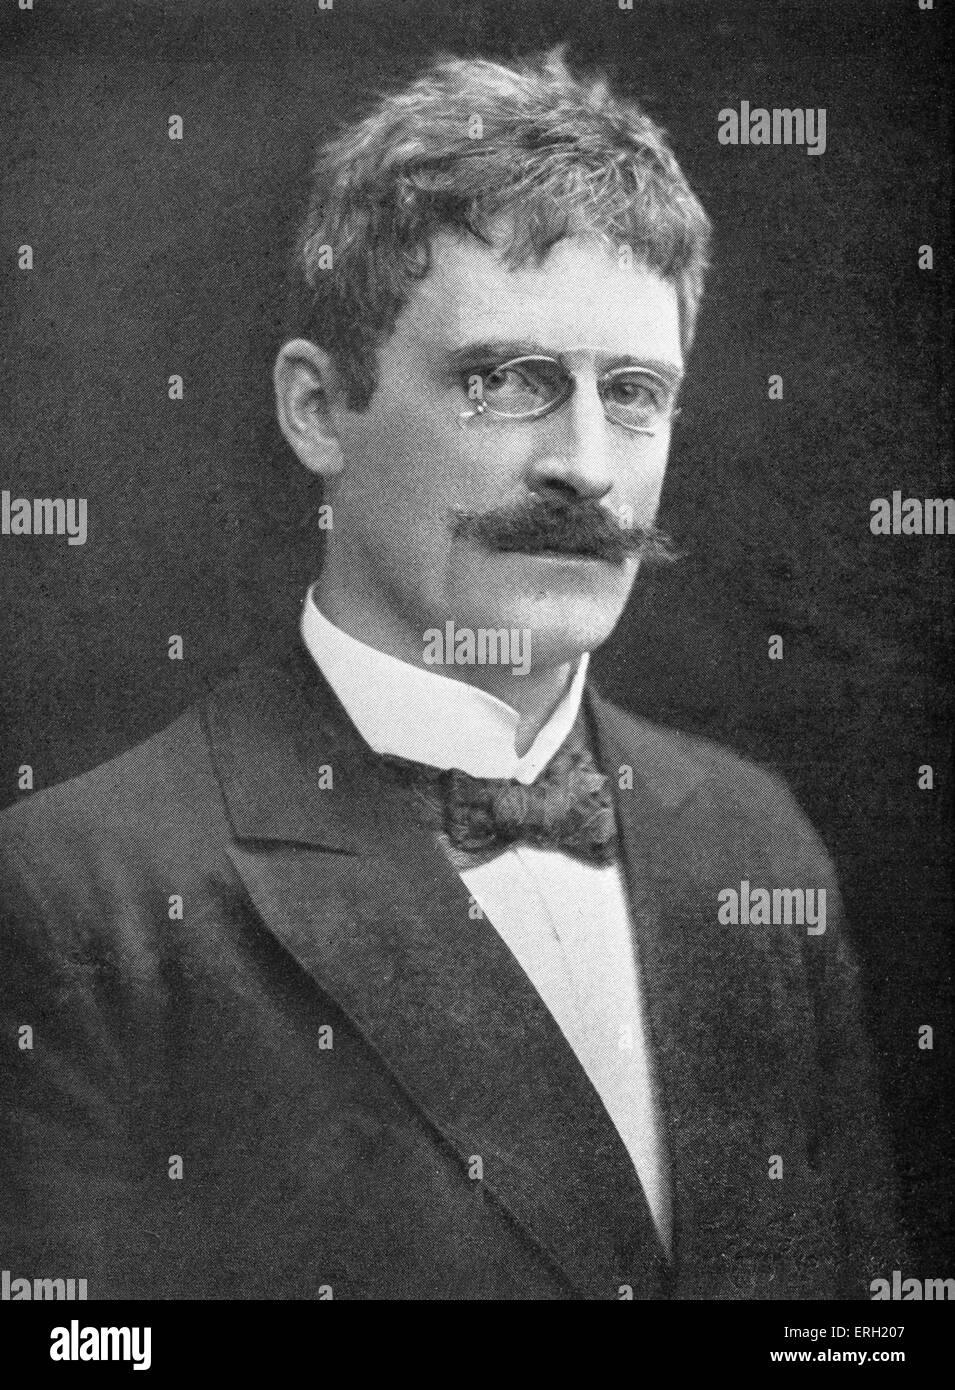 Norwegian Author Winner Of The 1920 Nobel Prize For Literature